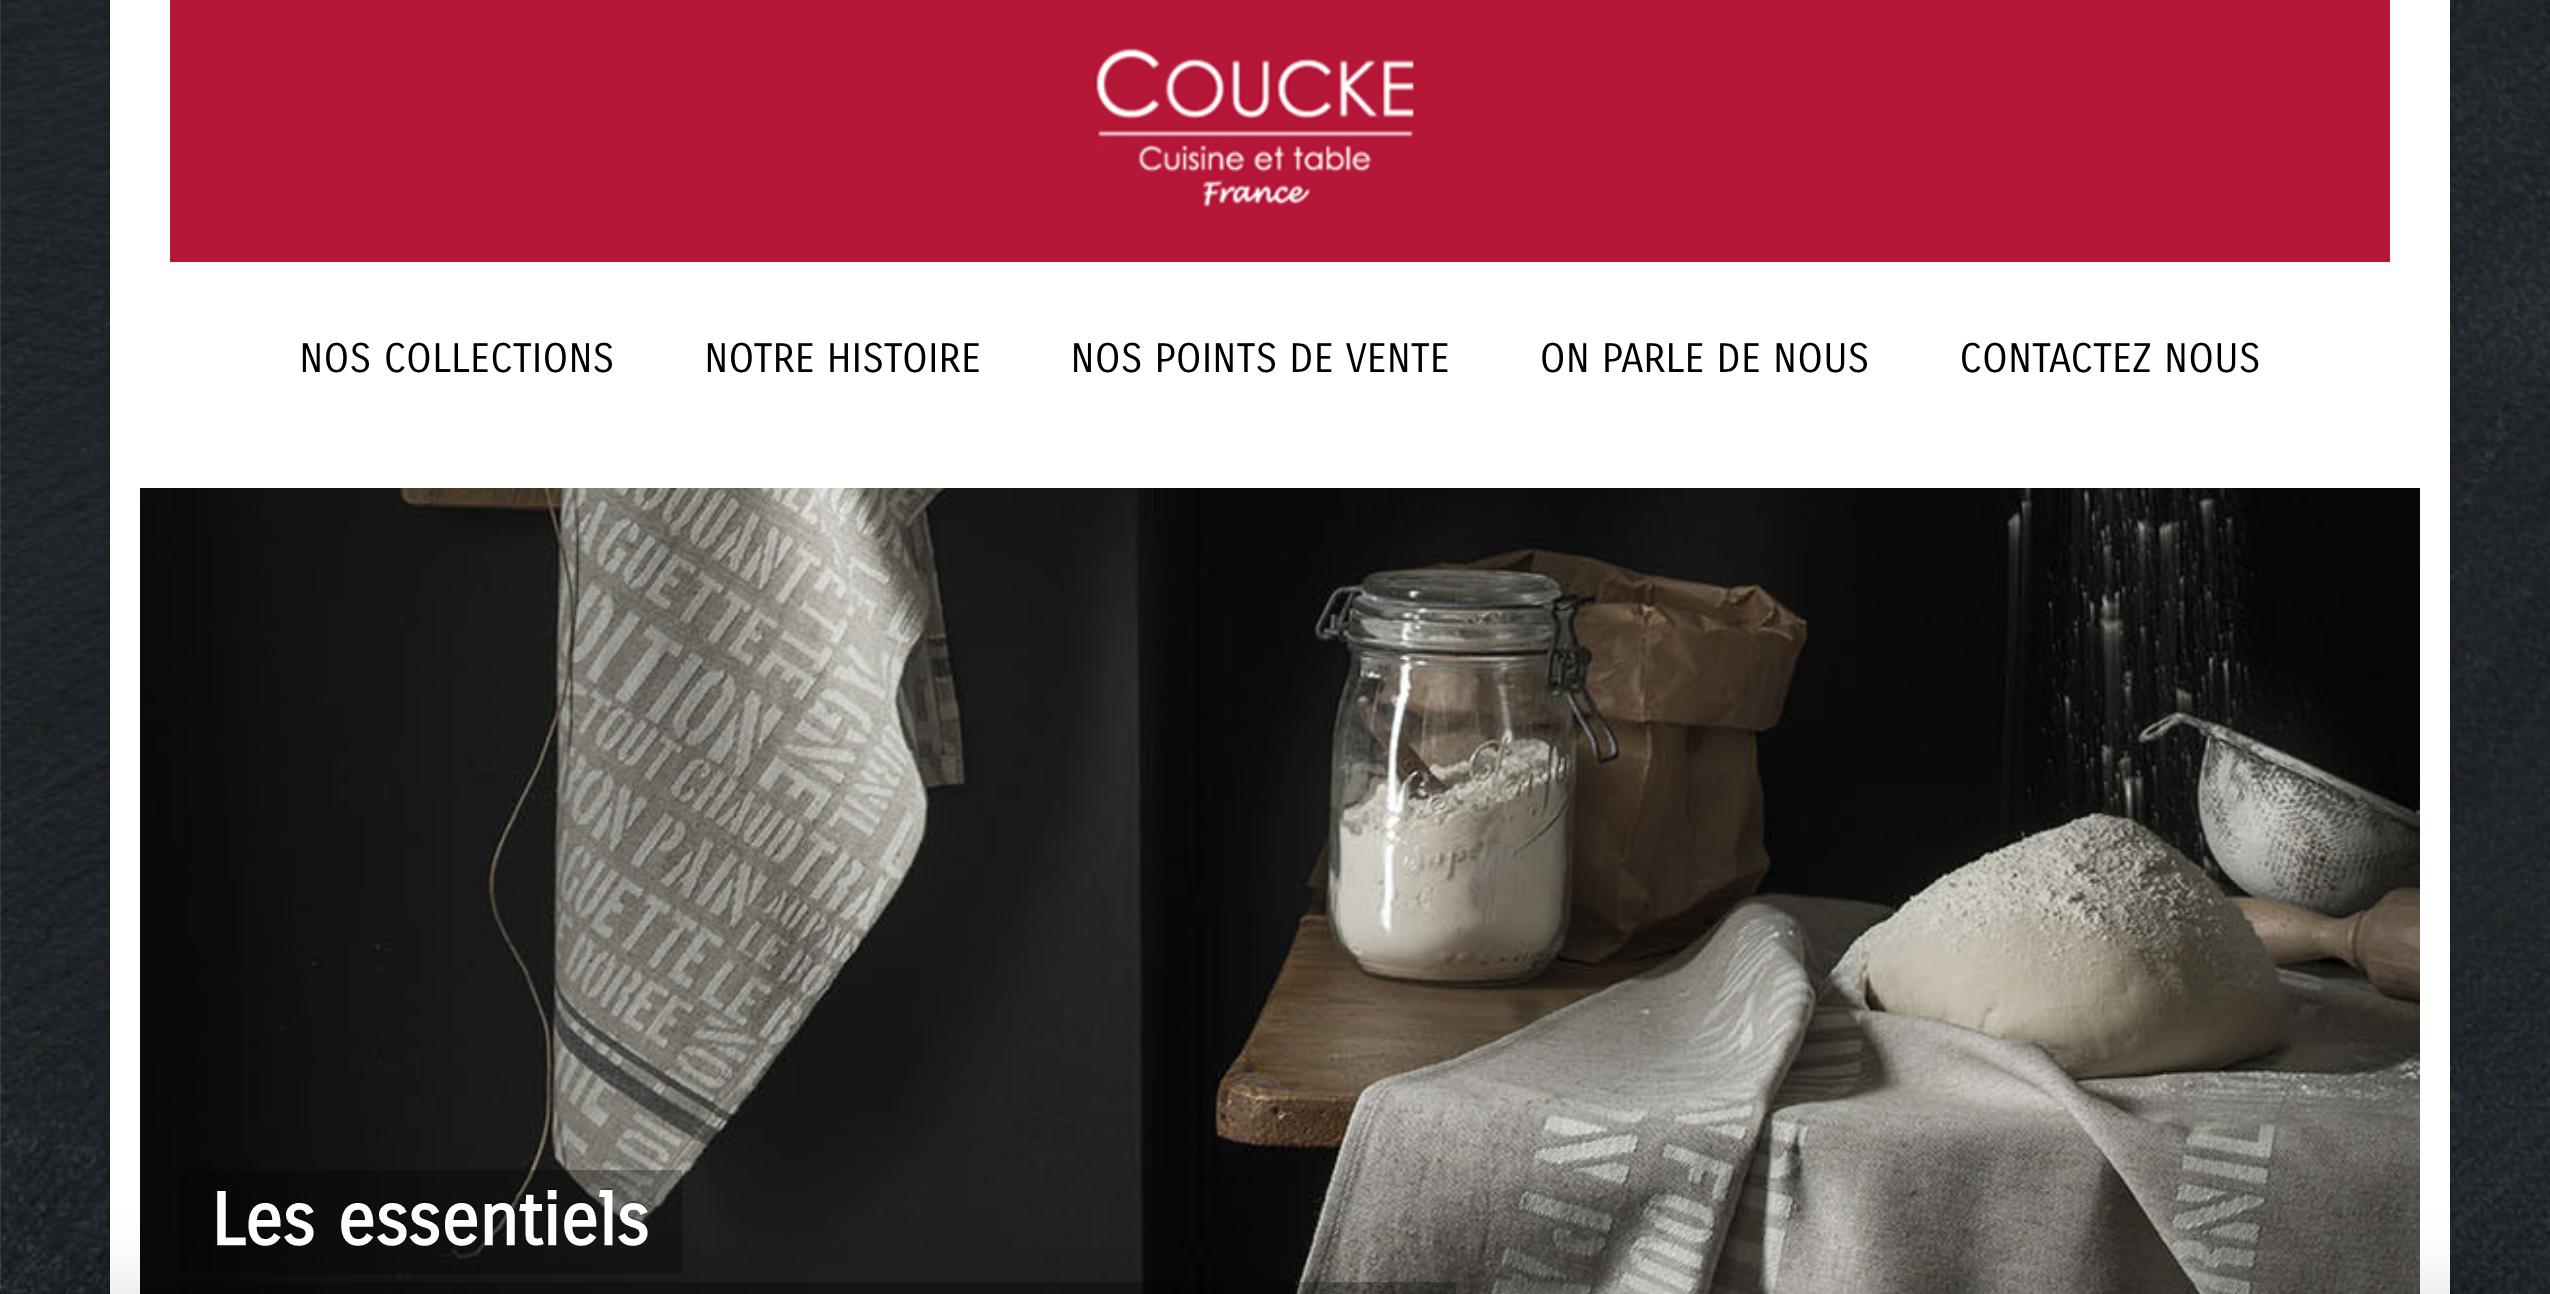 coucke cuisine